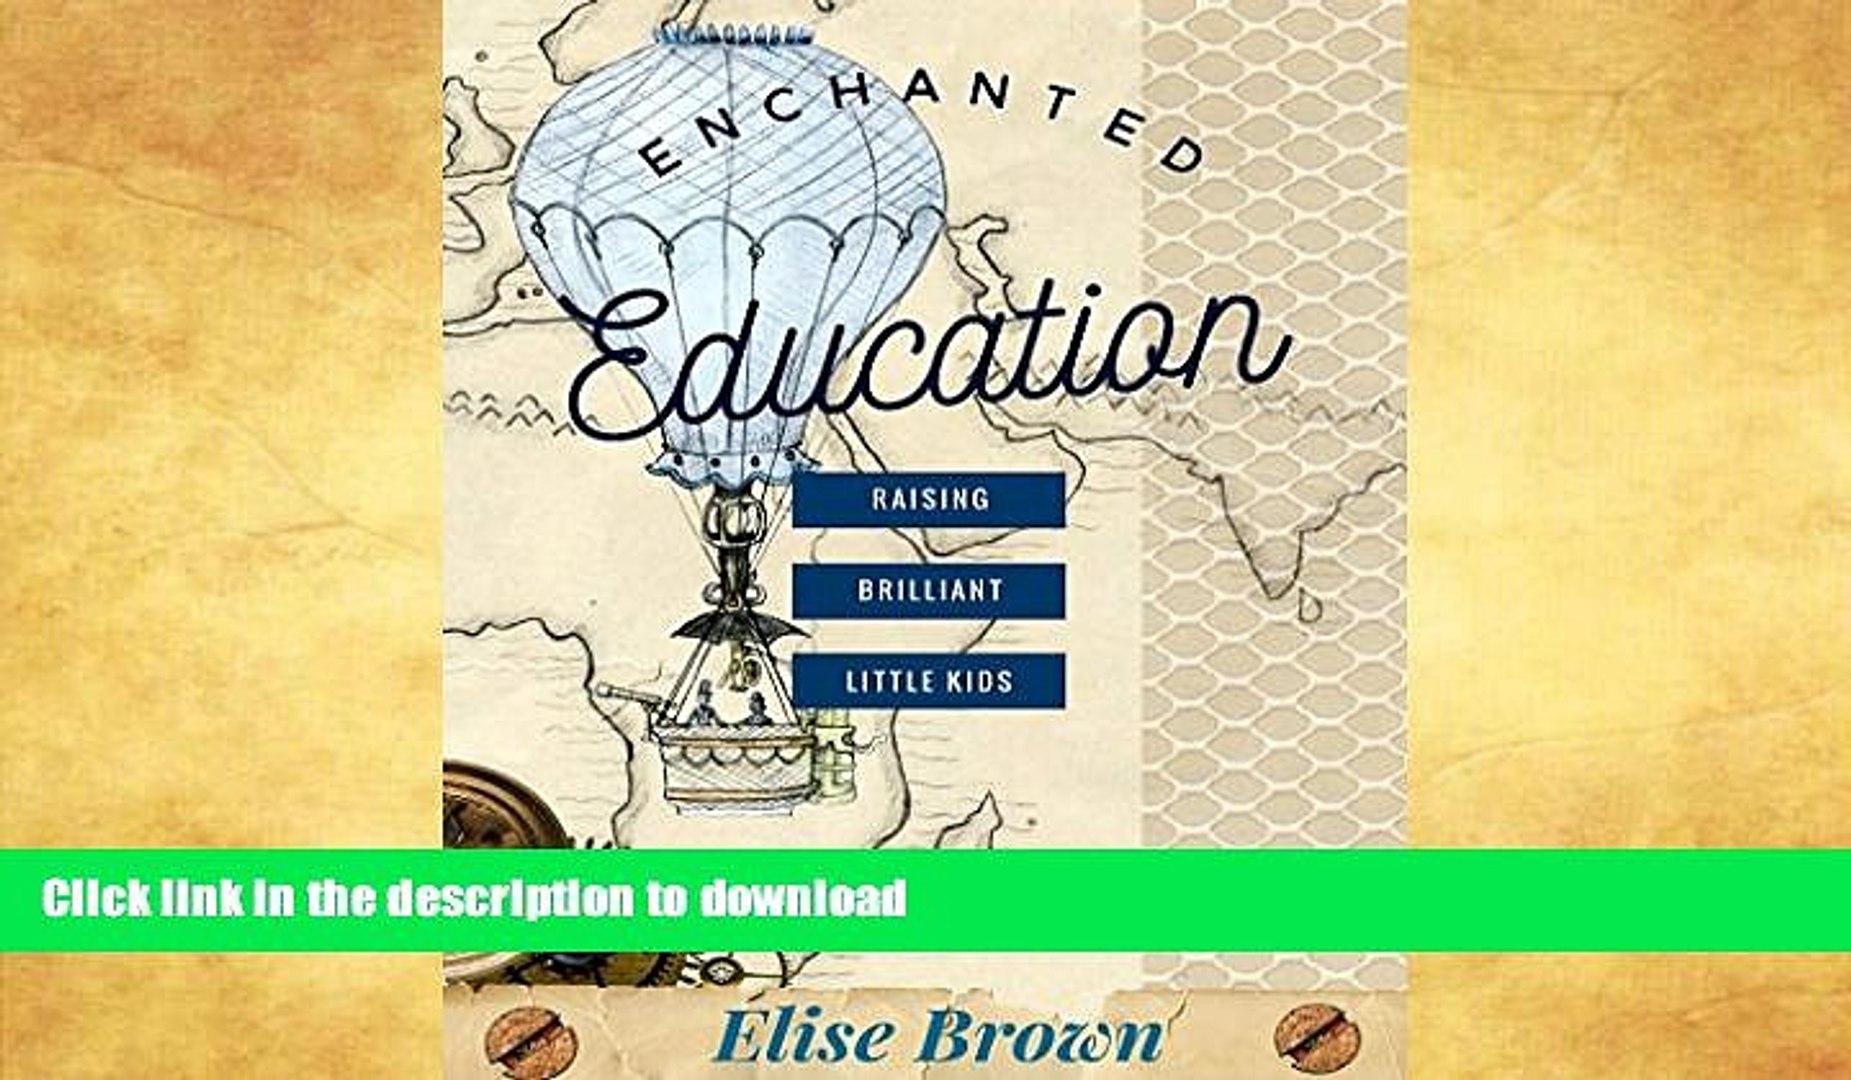 READ Enchanted Education: Raising Brilliant Little Kids Kindle eBooks